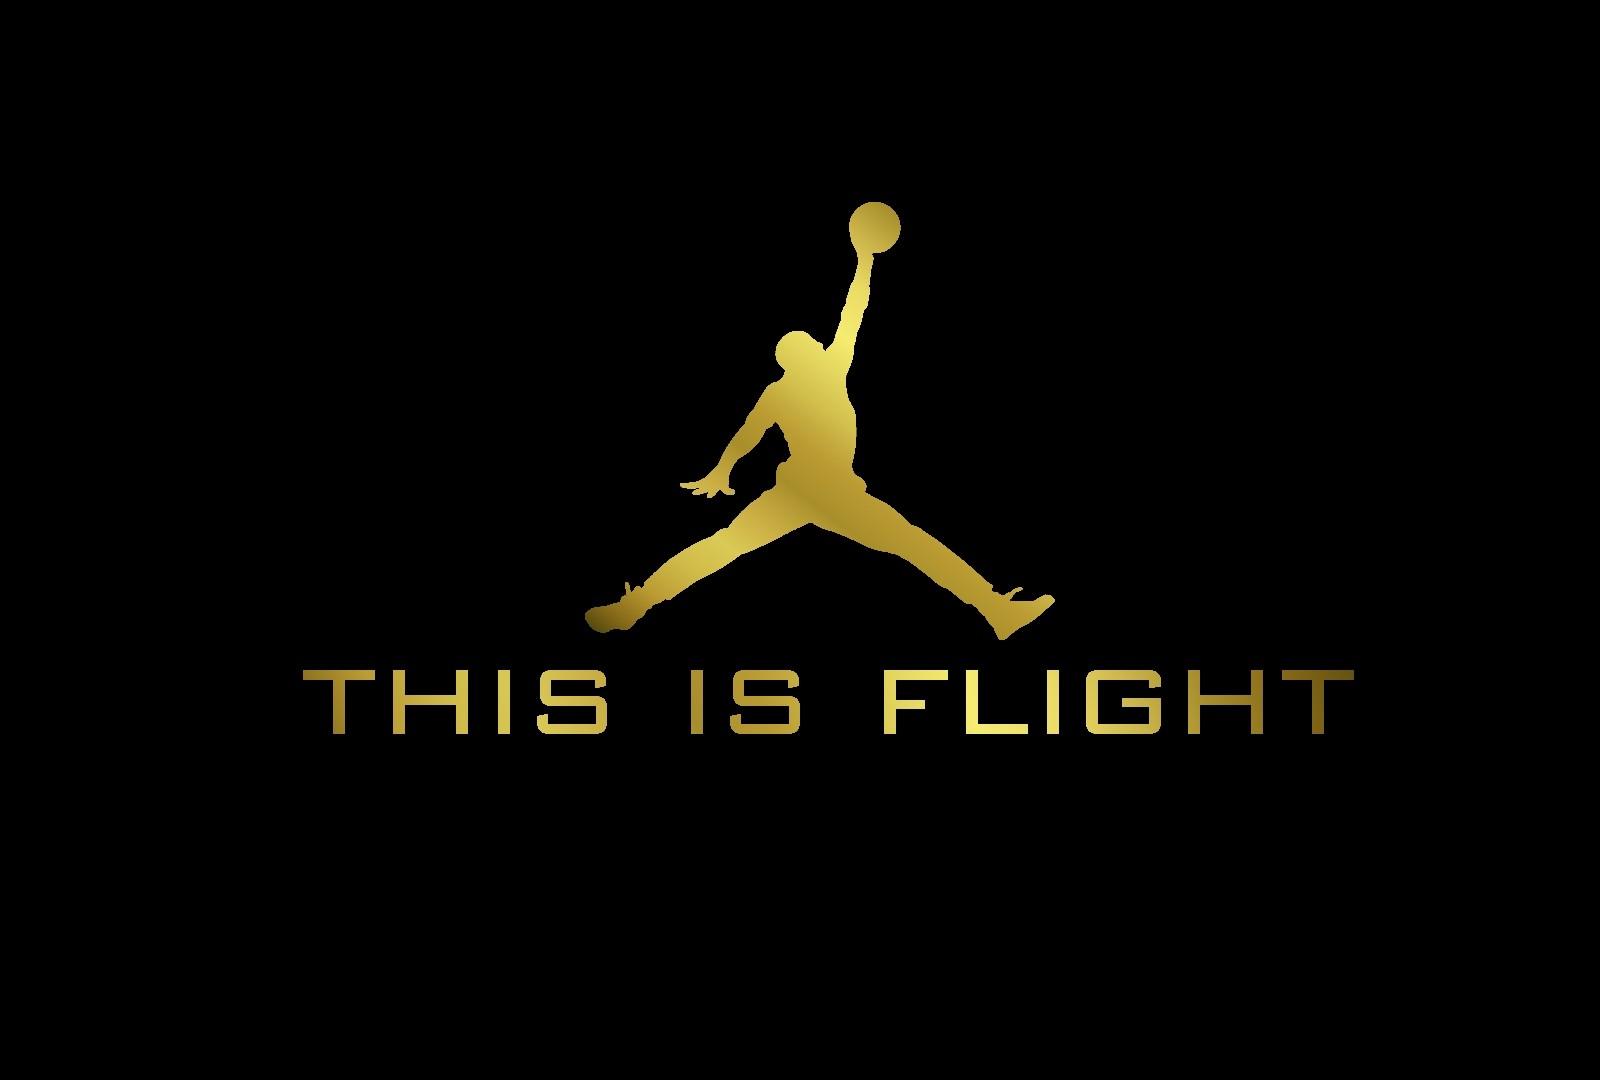 Wonderful Wallpaper Logo Jordan - text-logo-brand-Michael-Jordan-font-1600x1080-px-542542  Gallery_358537.jpg